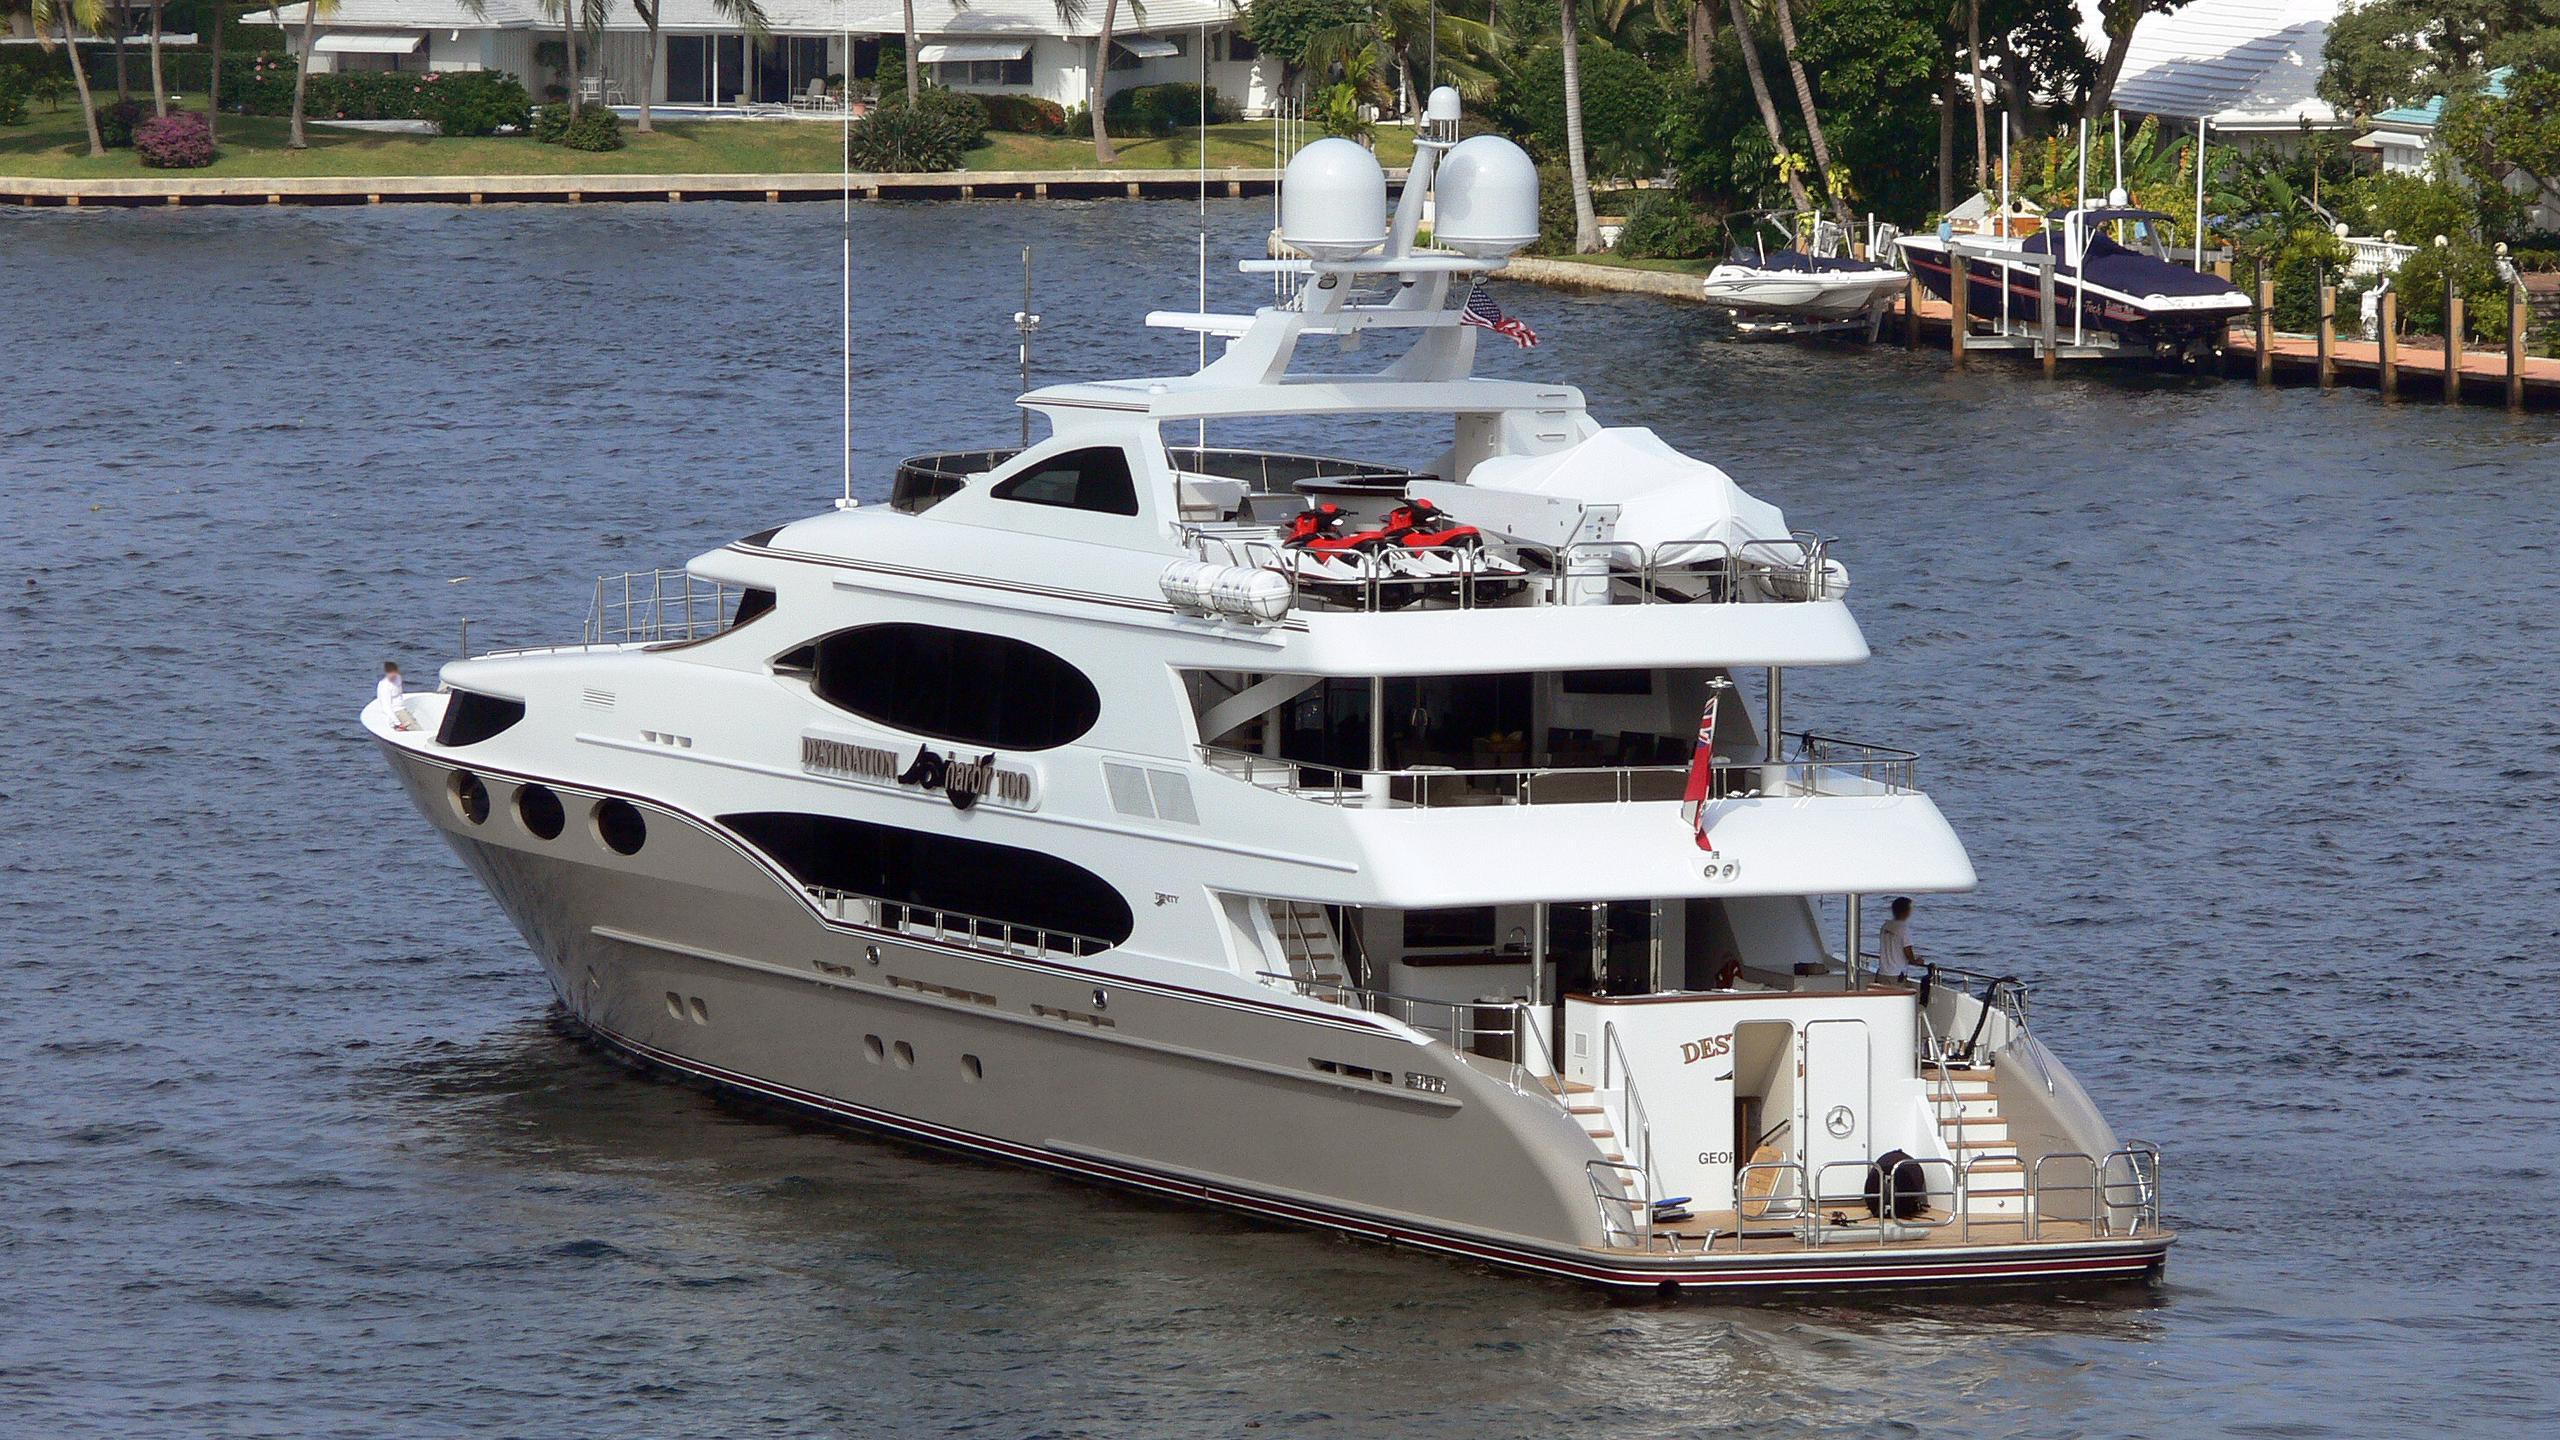 hunter-mustang-sally-motor-yacht-trinity-161-2008-49m-stern